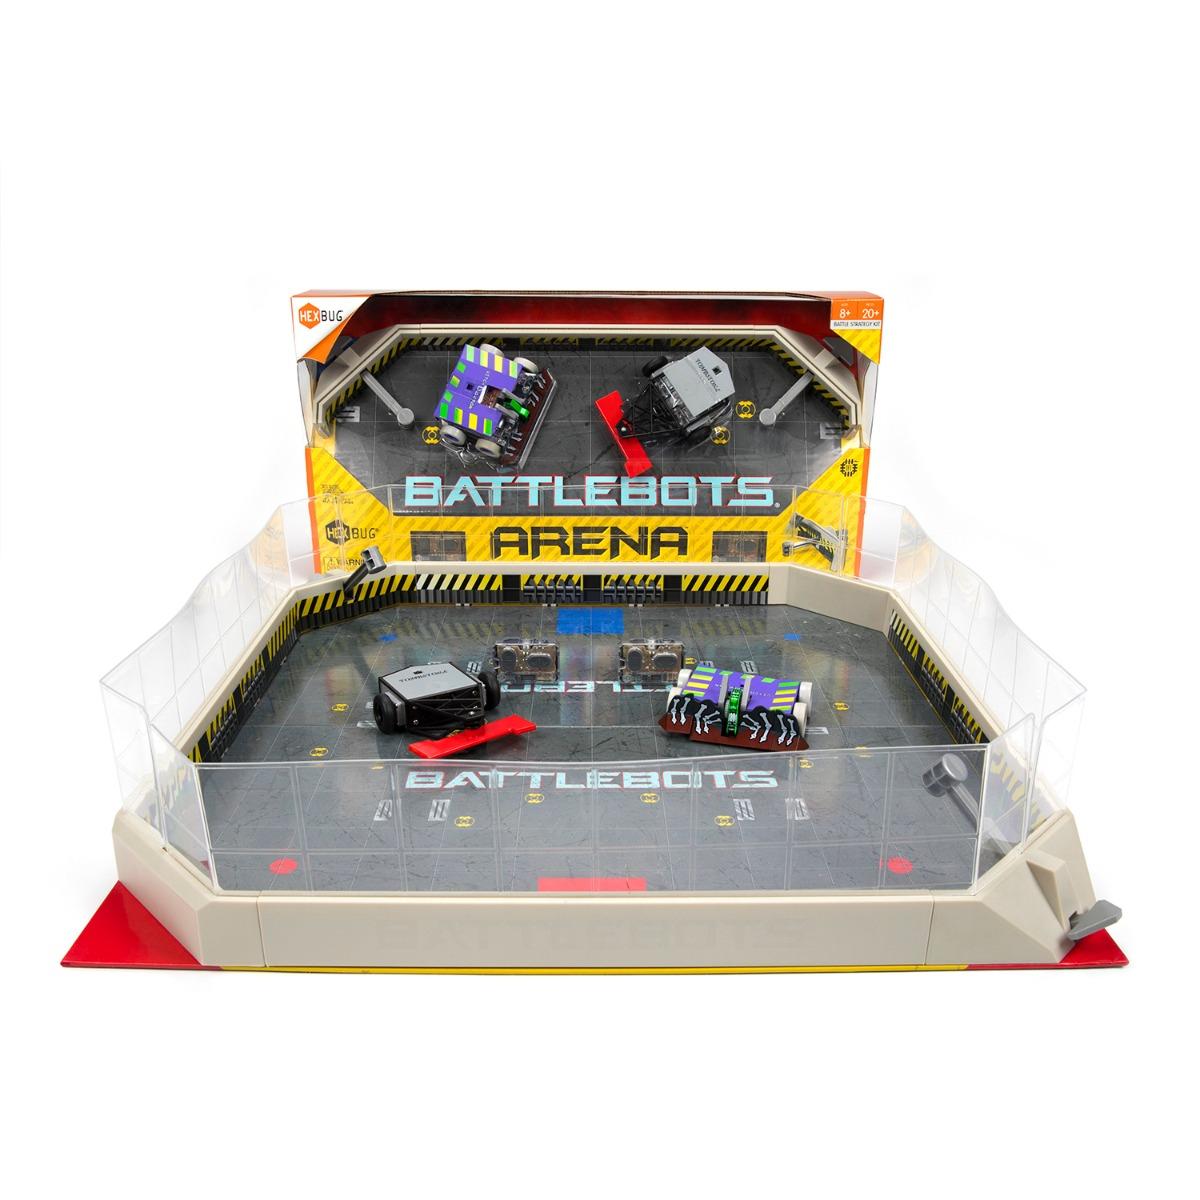 Set cu Arena si Roboti de lupta cu telecomanda BattleBots Hexbug, Rivals (Witch Doctor, Tombstone)